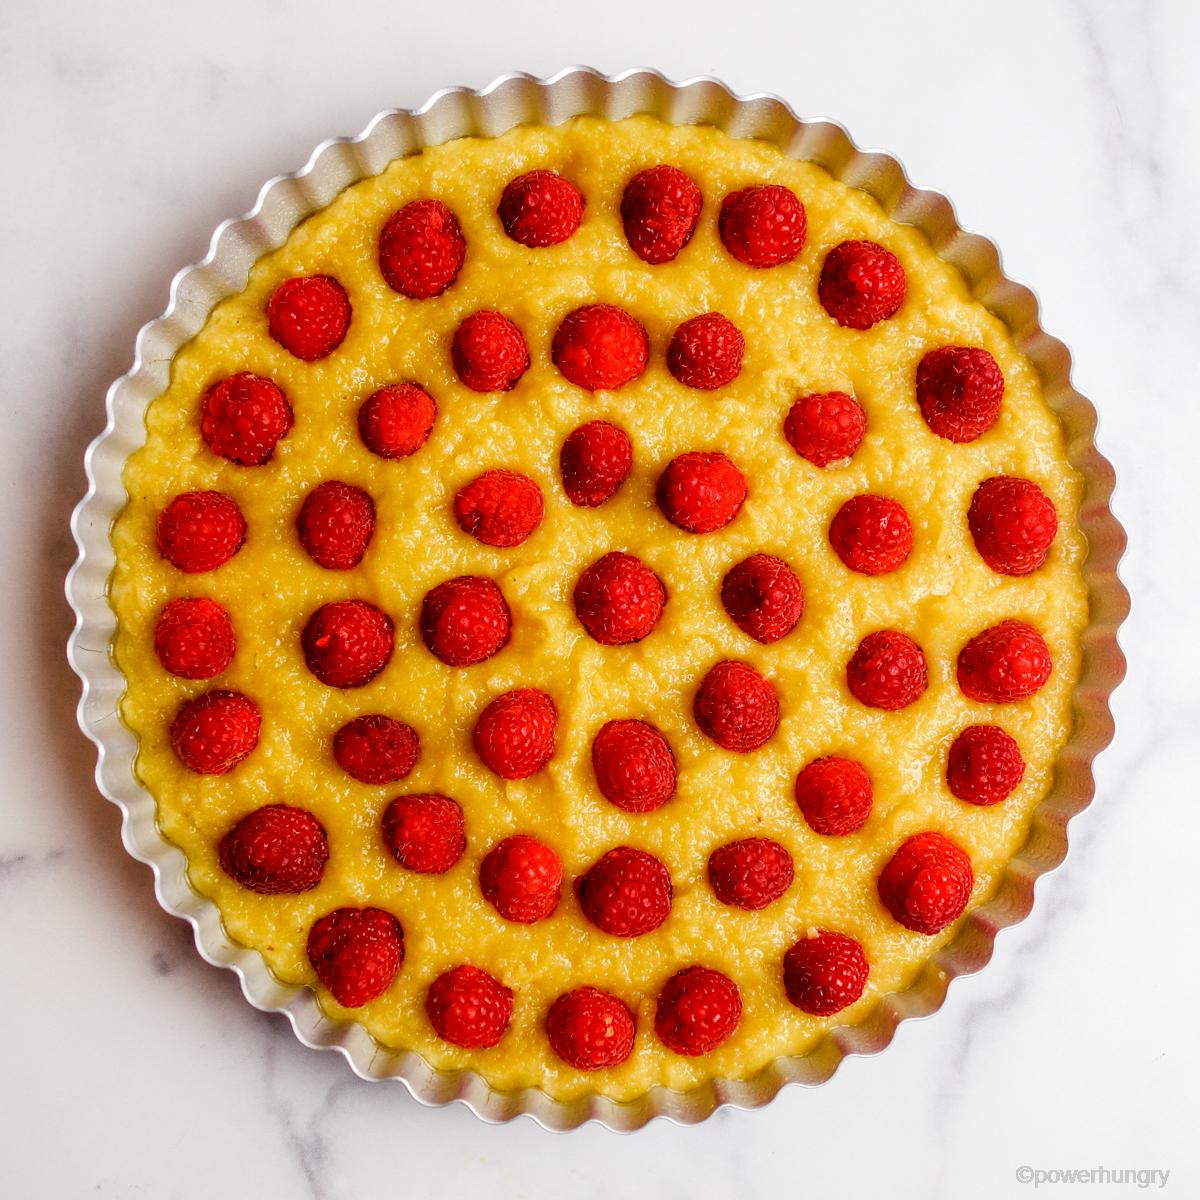 uncooked vegan no-crust raspberry almond tart